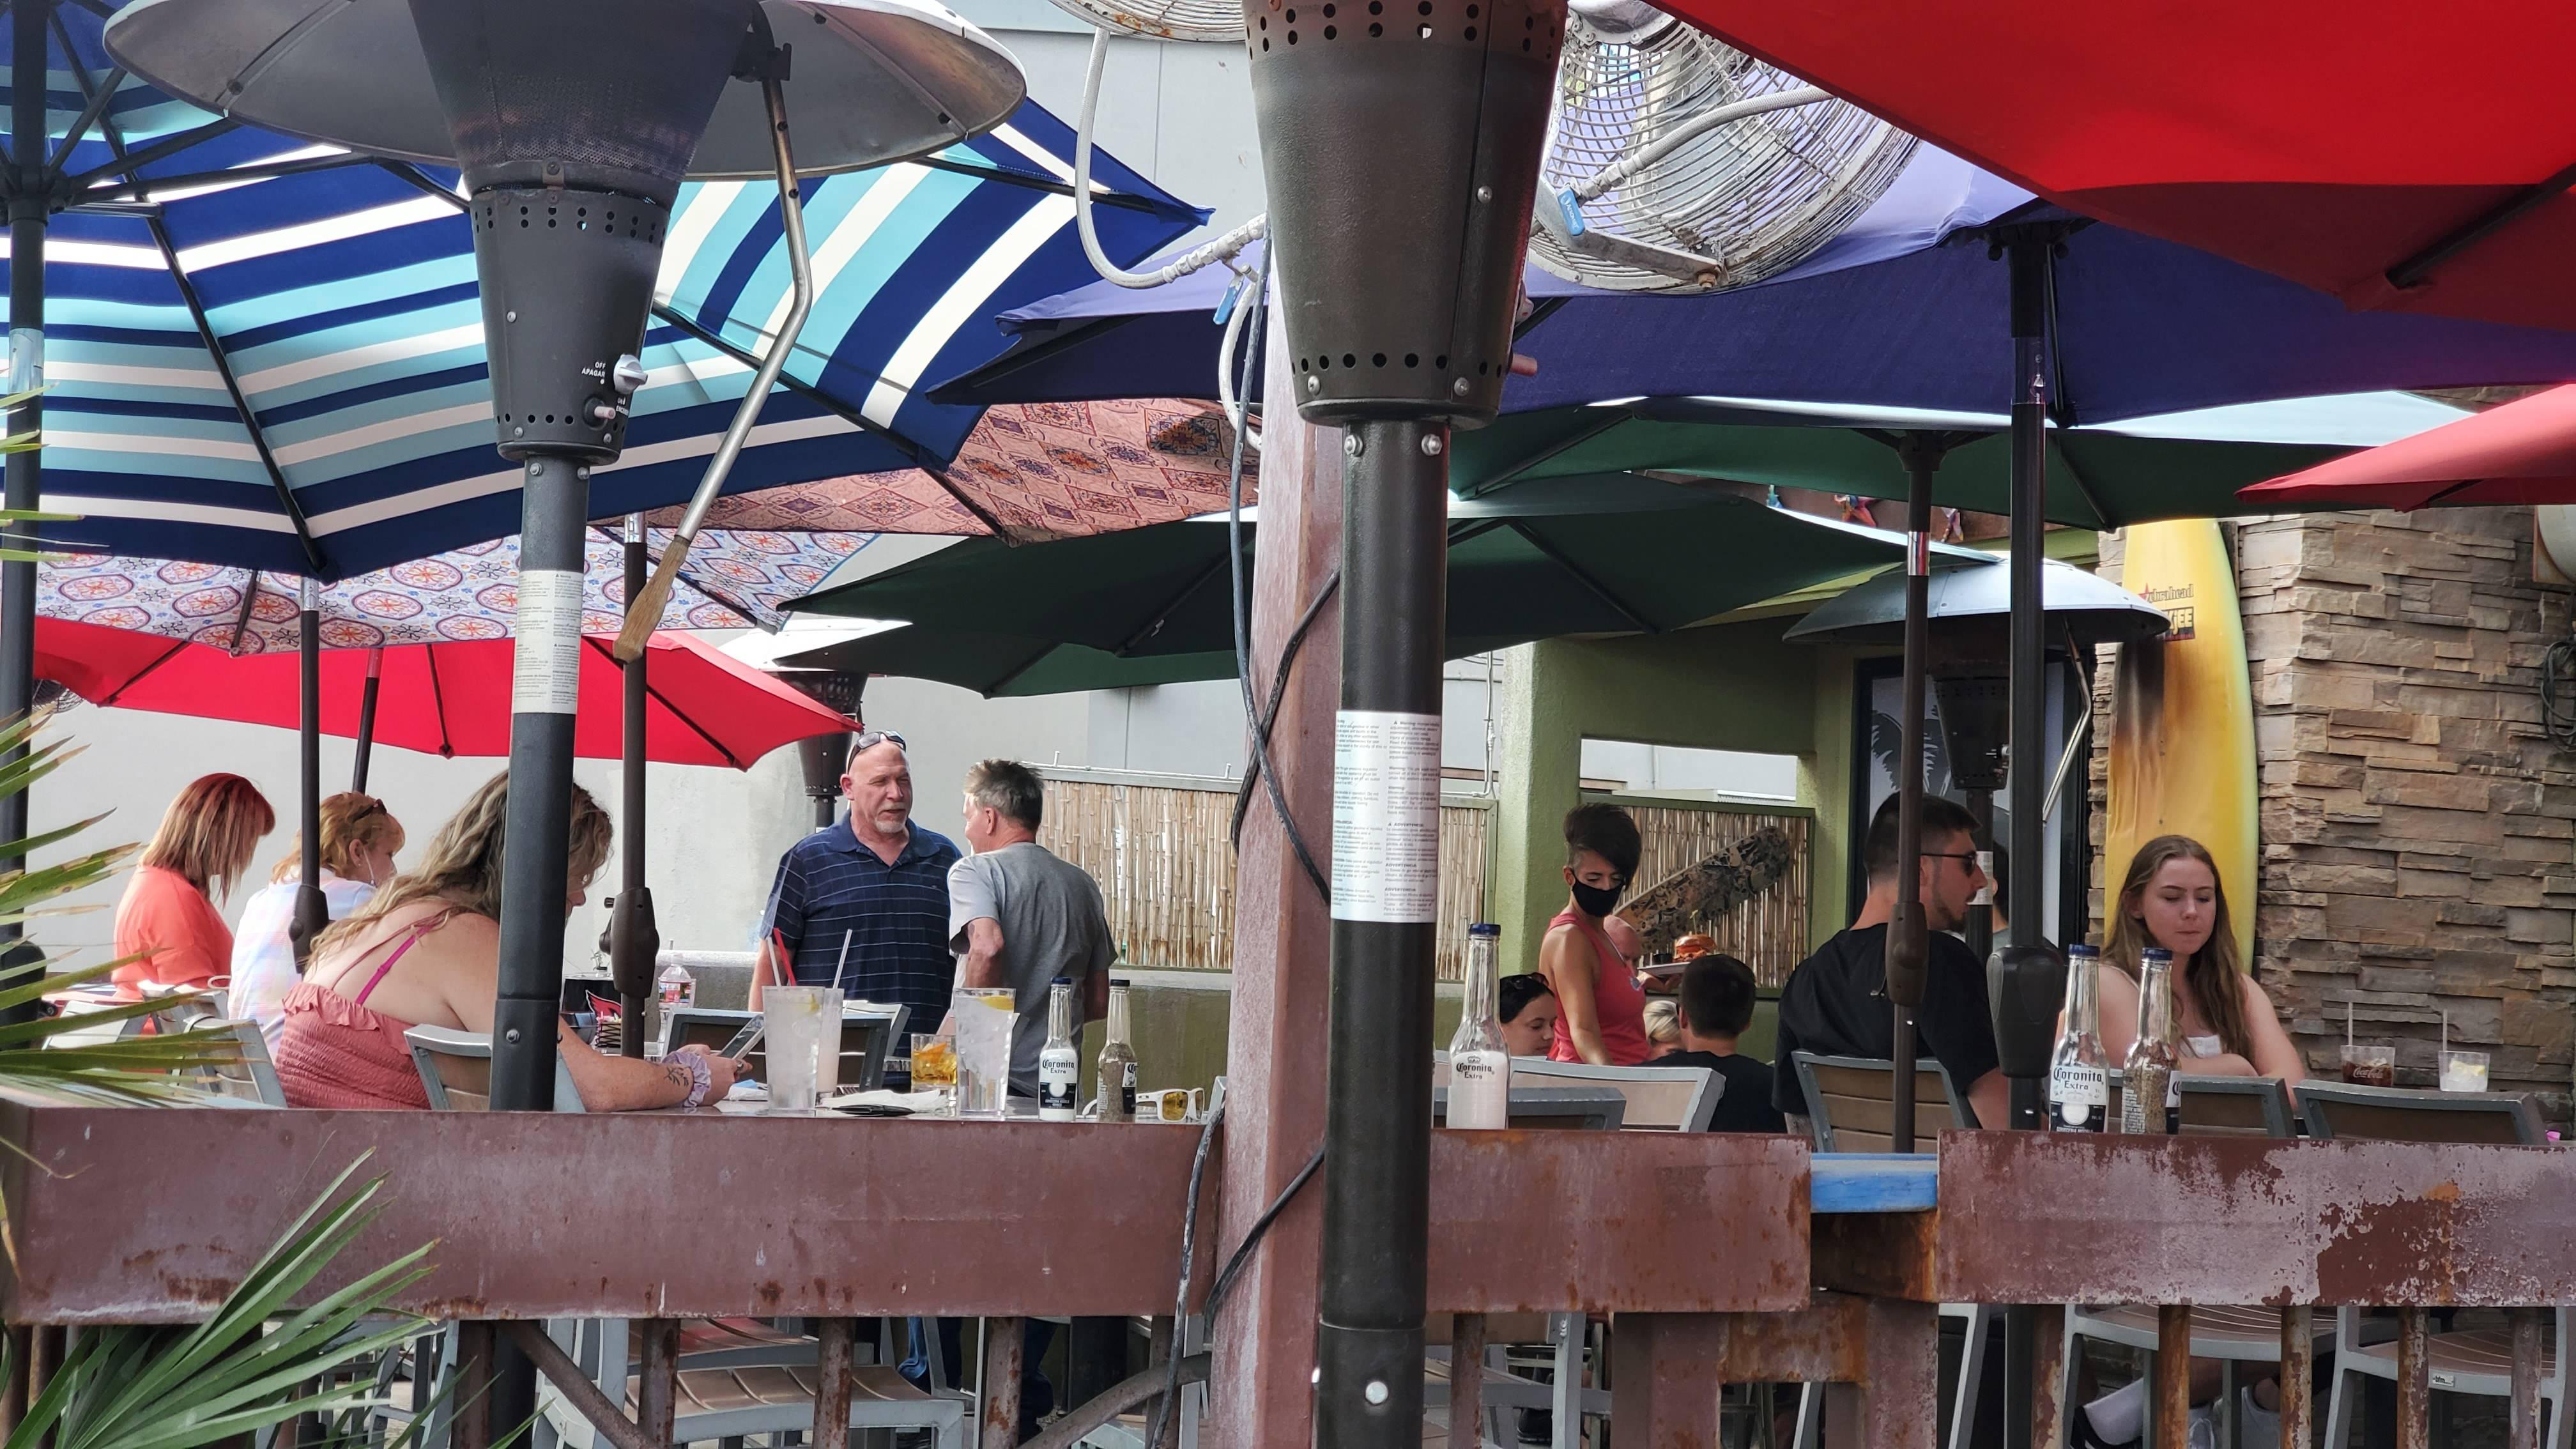 rehab burger patio in scottsdale arizona